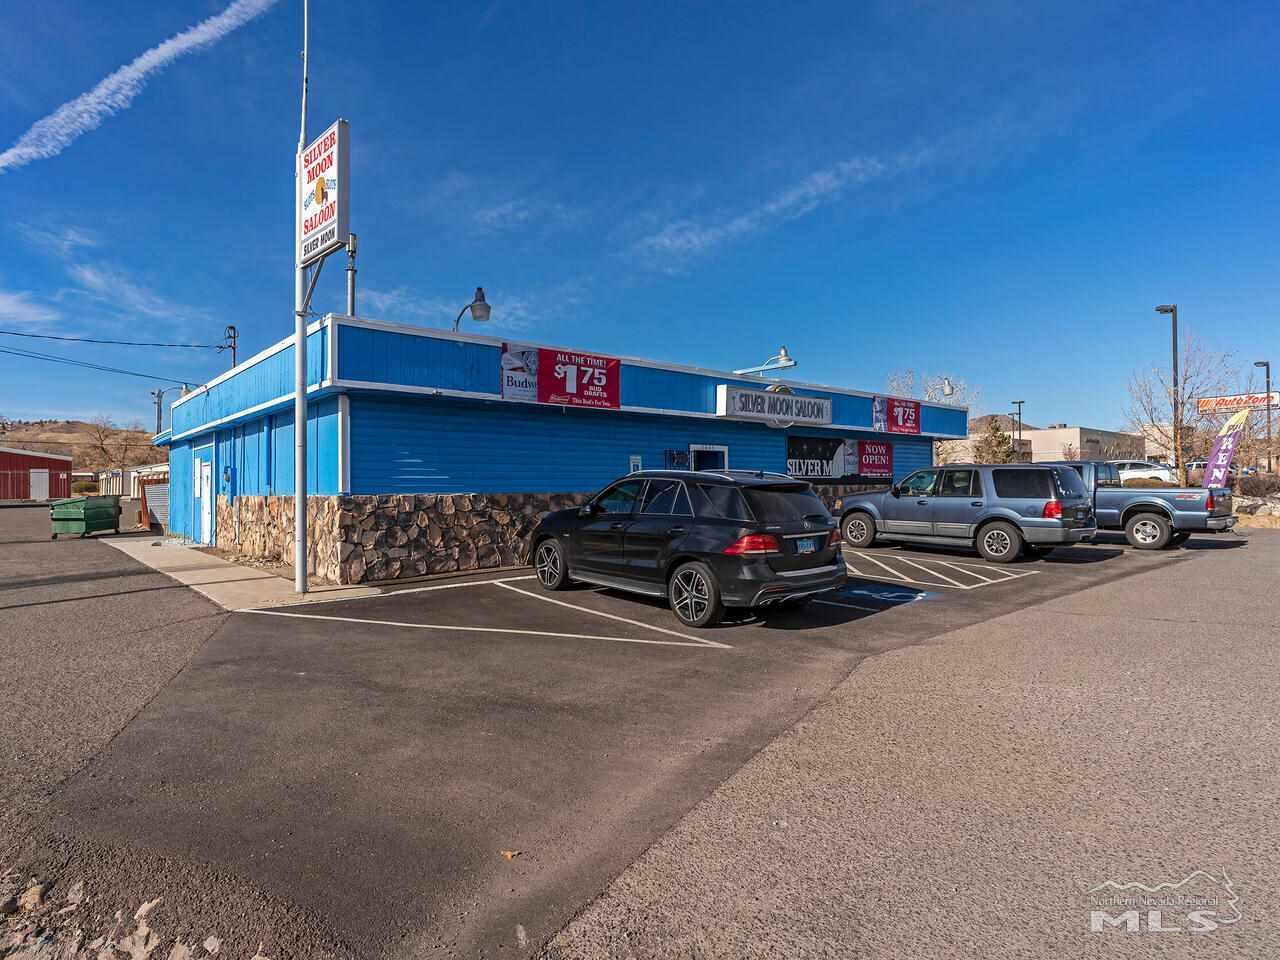 Image for 5465 Sun Valley Blvd, Reno, NV 89433